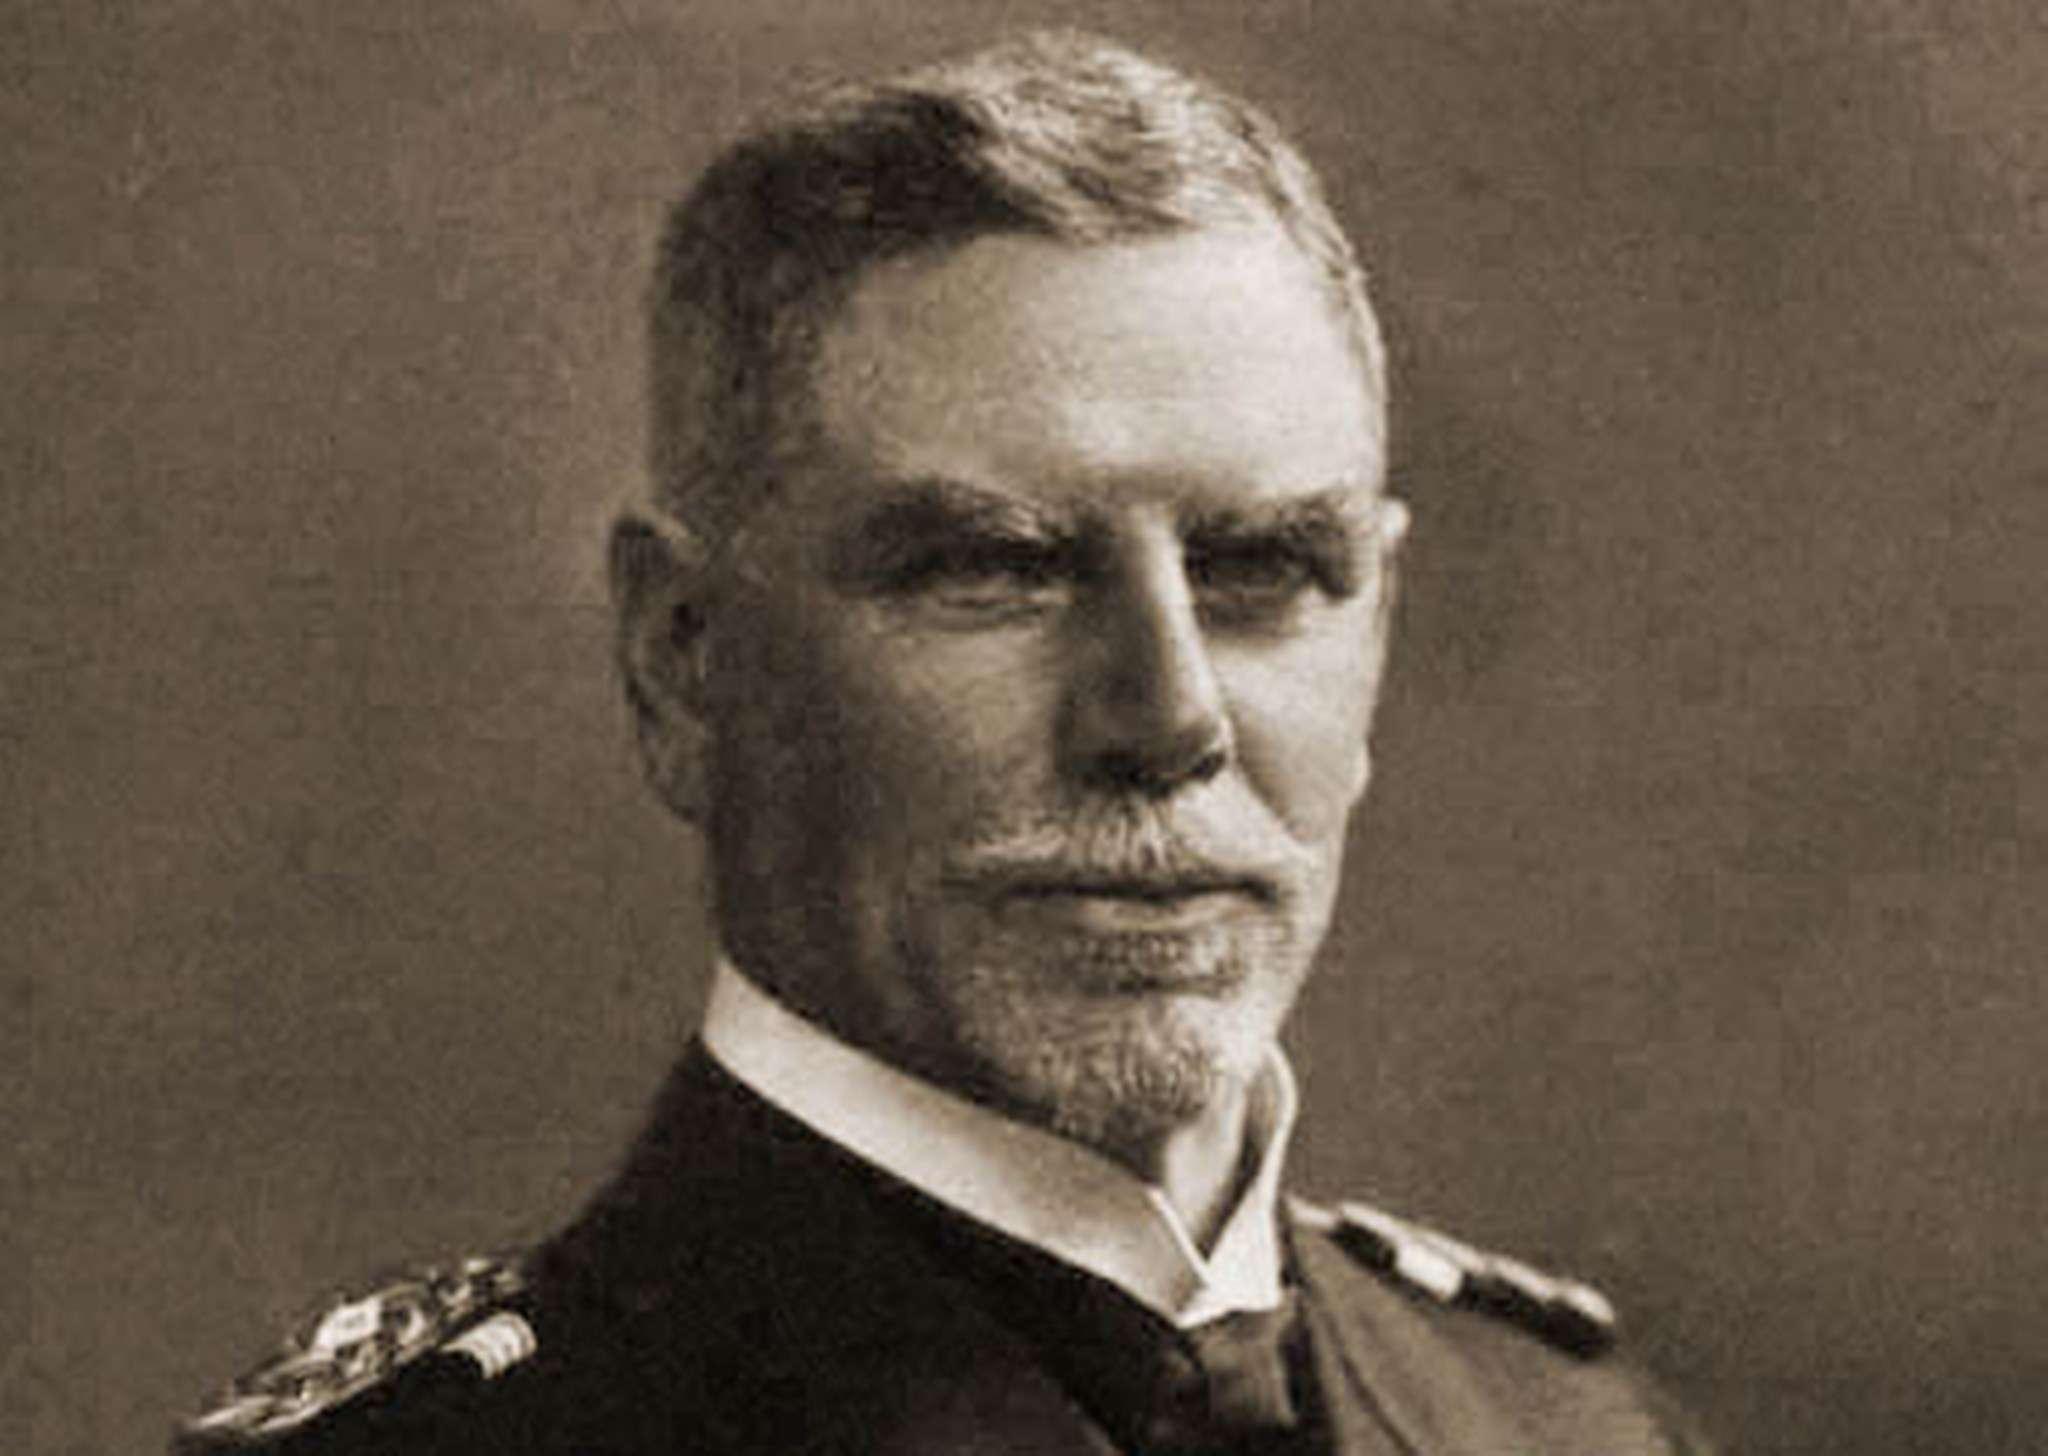 Portrait of Vice Admiral Maximilian von Spee wearing his naval uniform.